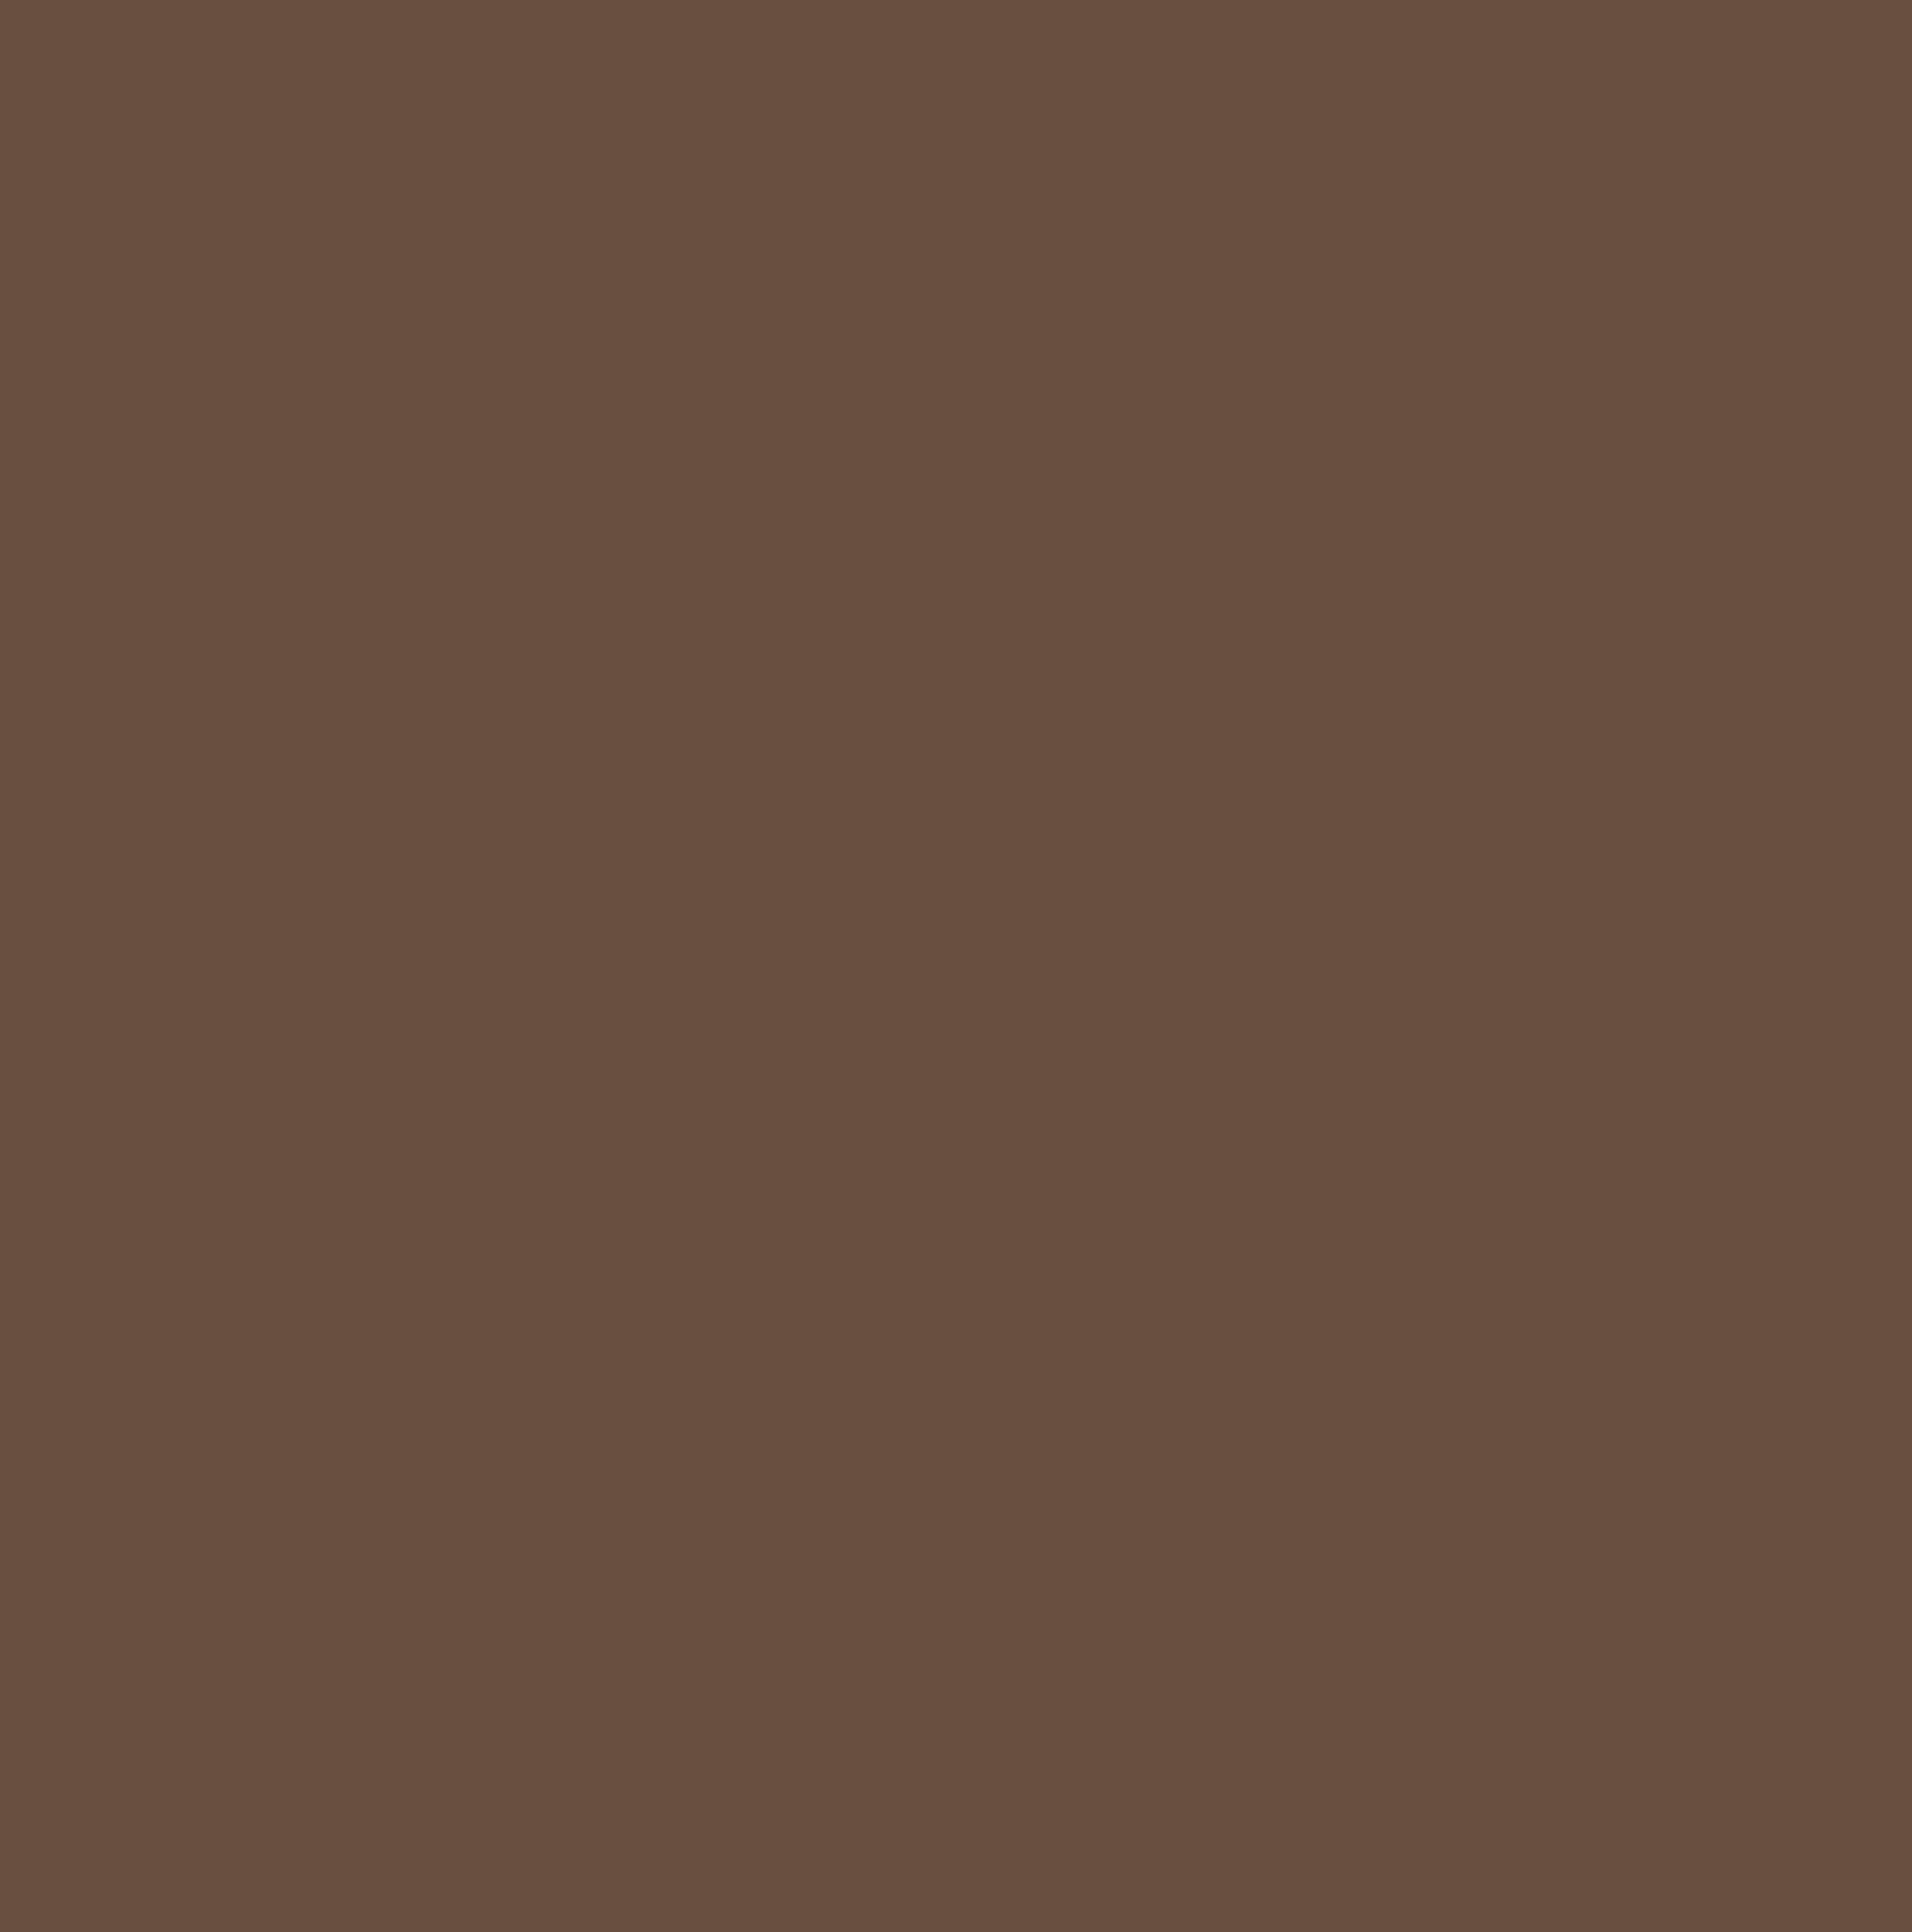 LOGO_OKO_CREATIONS_ZD_01.png